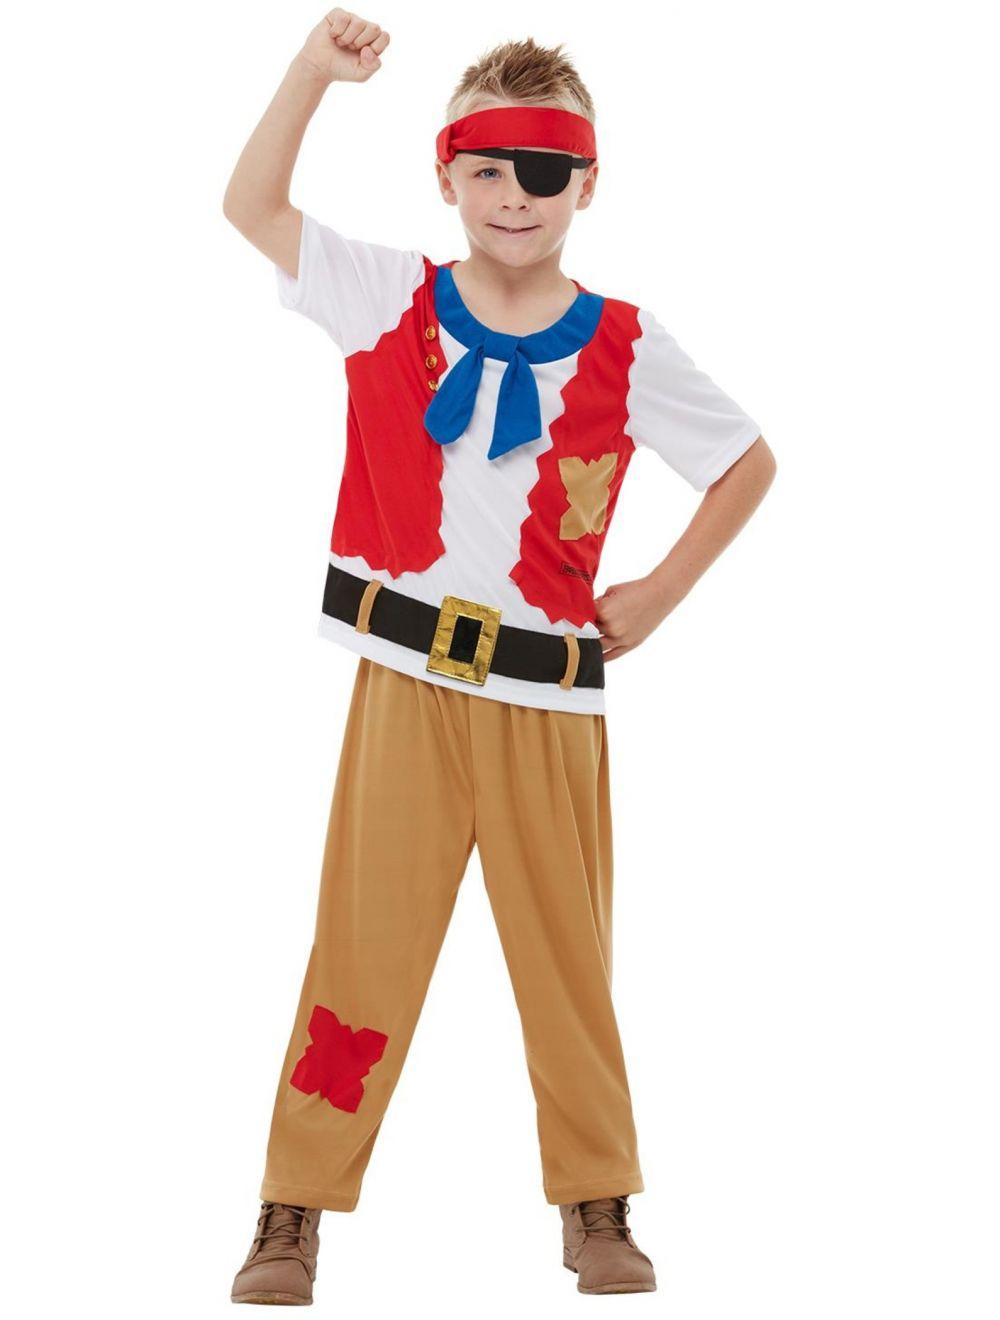 Kids Curved Pirate Sword World Book Day Pirate Fancy Dress Costume Accessory